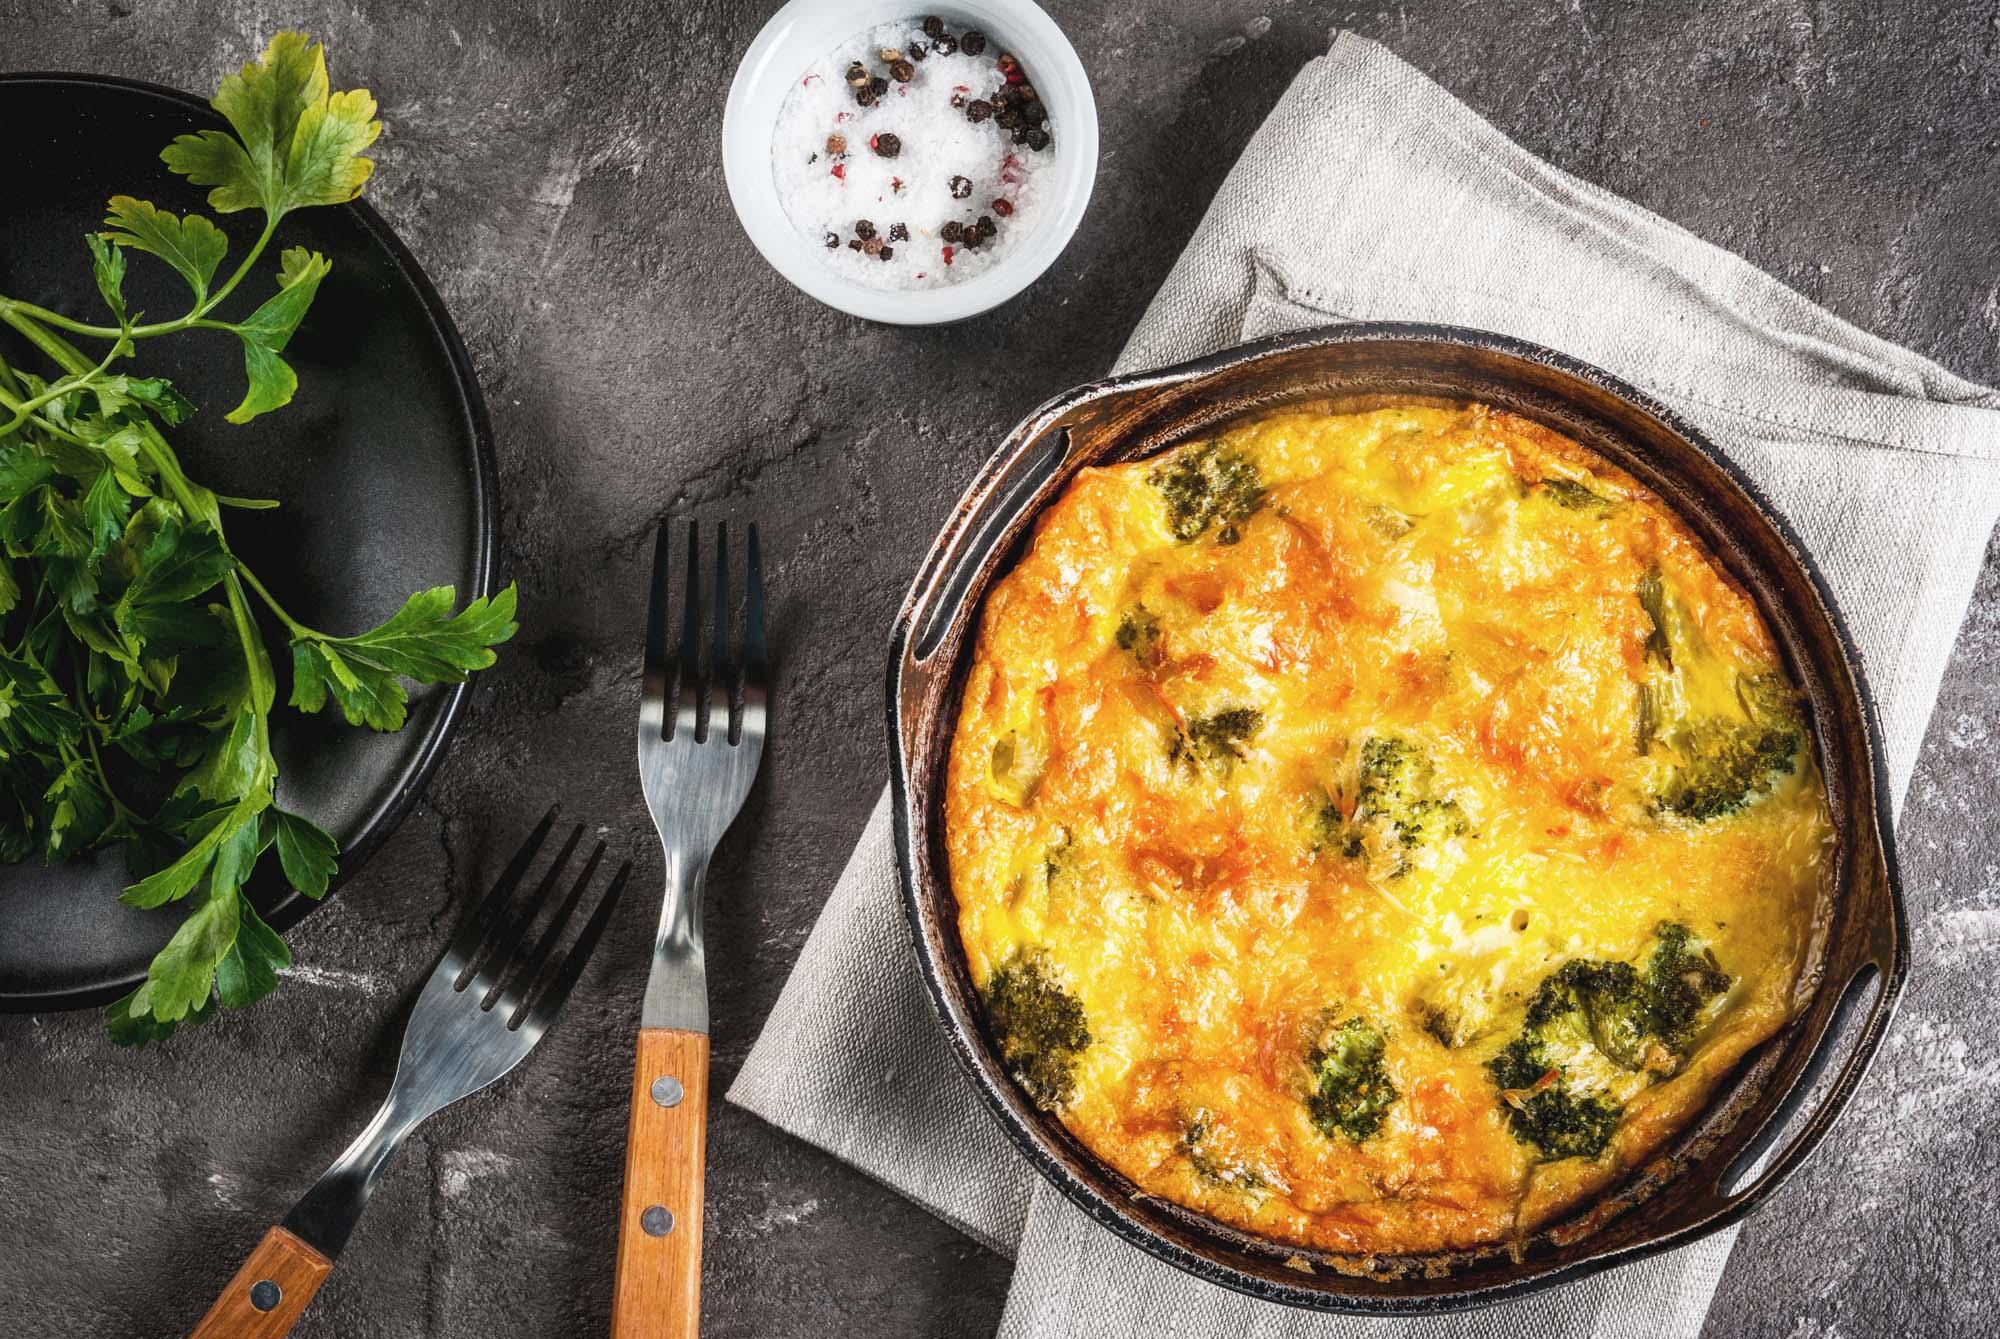 Broccoli and feta cheese